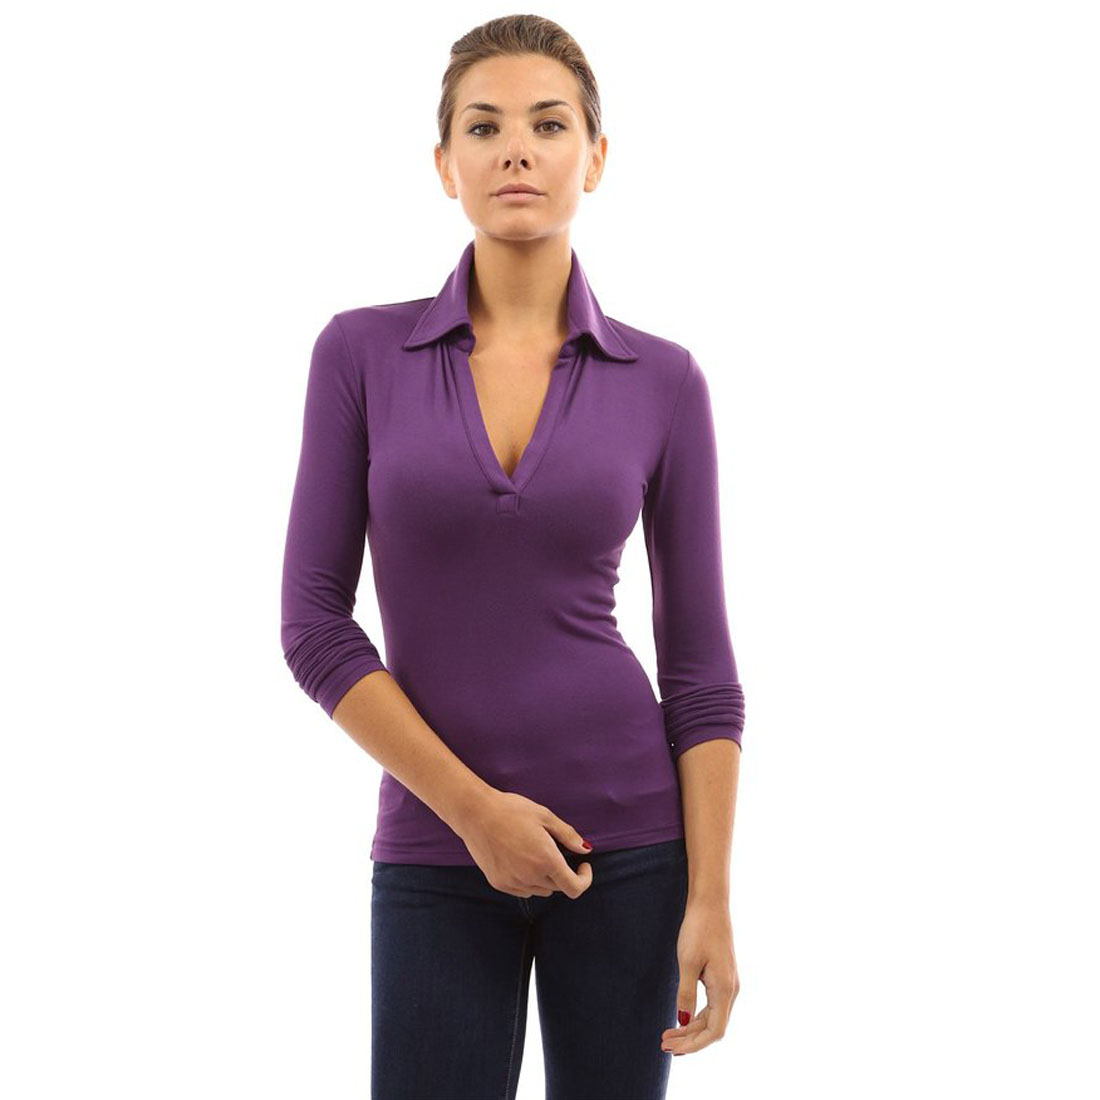 Polo Blouse V Neck Womens Long Short Sleeve Shirts Tops Casual ...